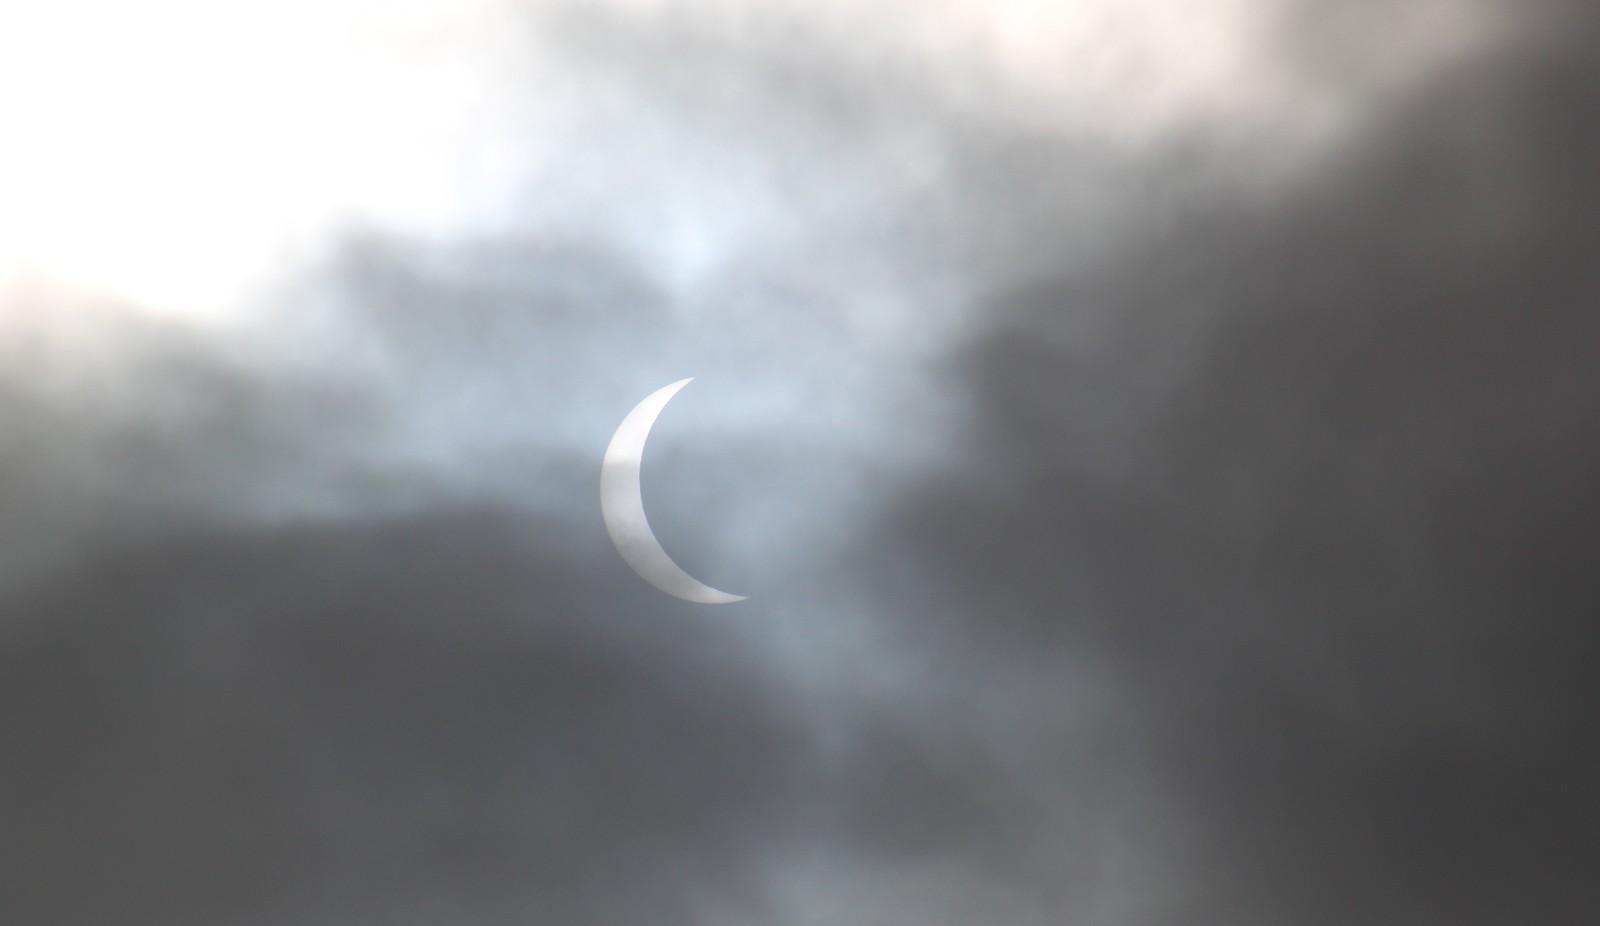 Solformørkelsen 20. Mars, sett fra Rissa